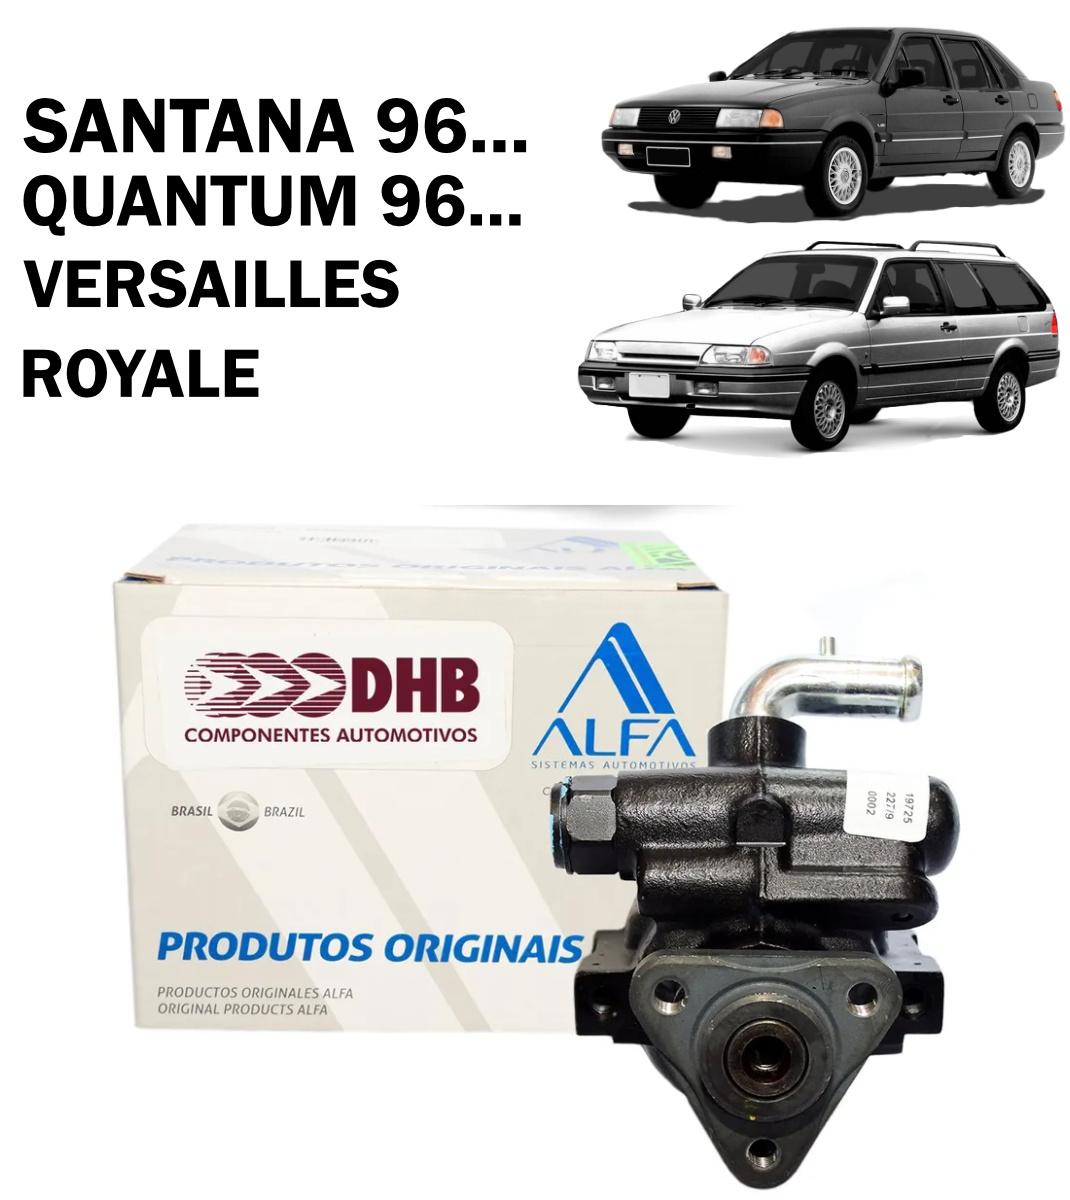 Bomba Direção Hidráulica DHB Santana 96..., Quantum 96..., Versailles, Royale